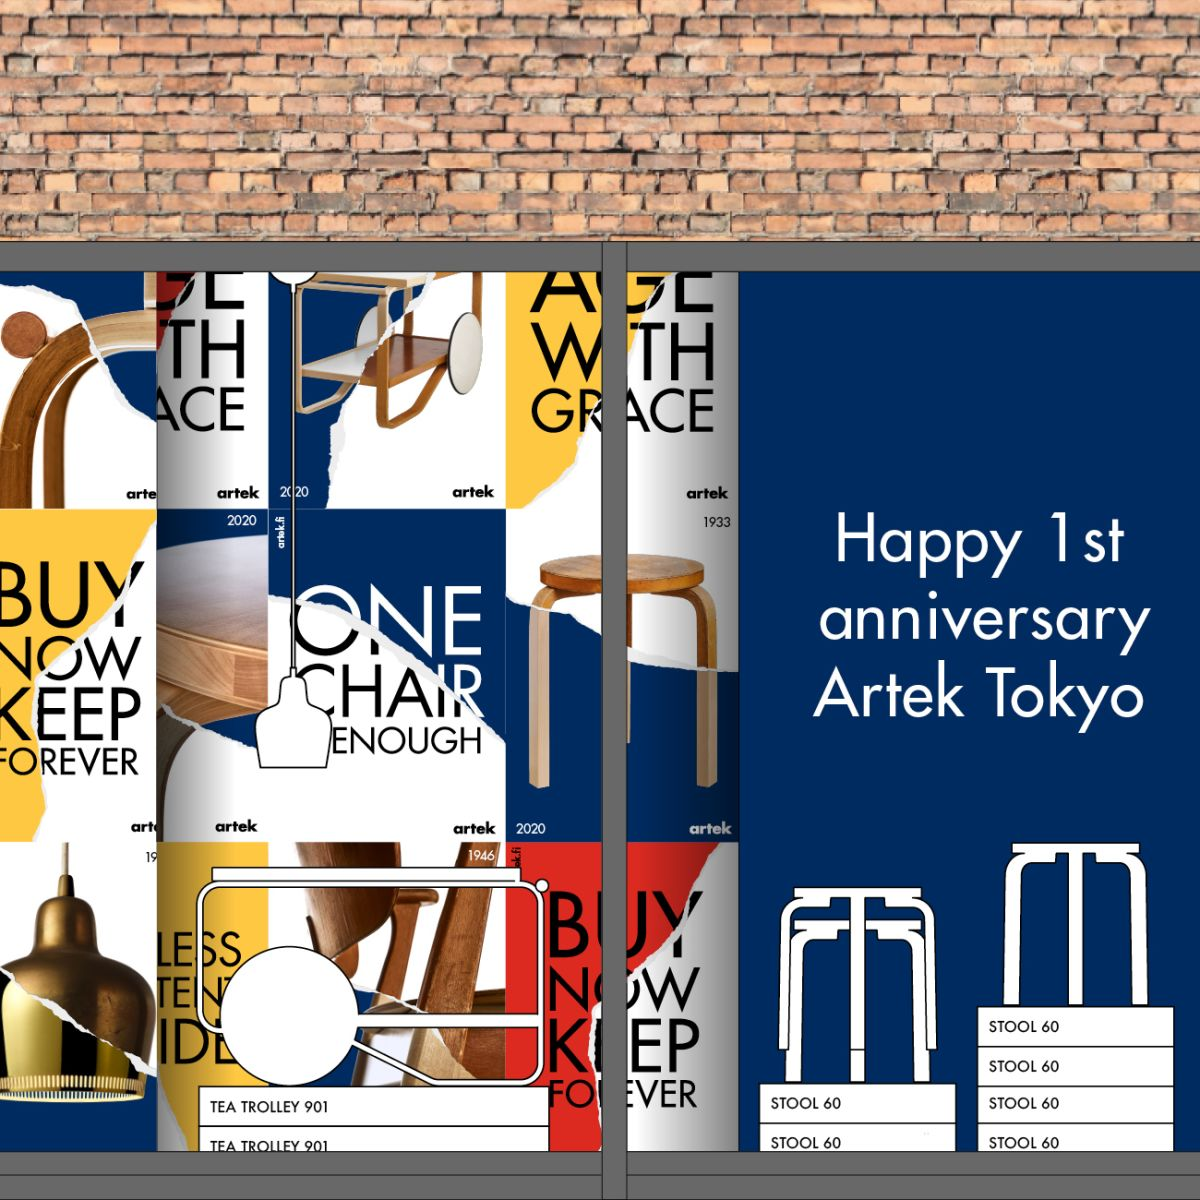 Main-image_Artek_CC_Tokyo_store_72dpi